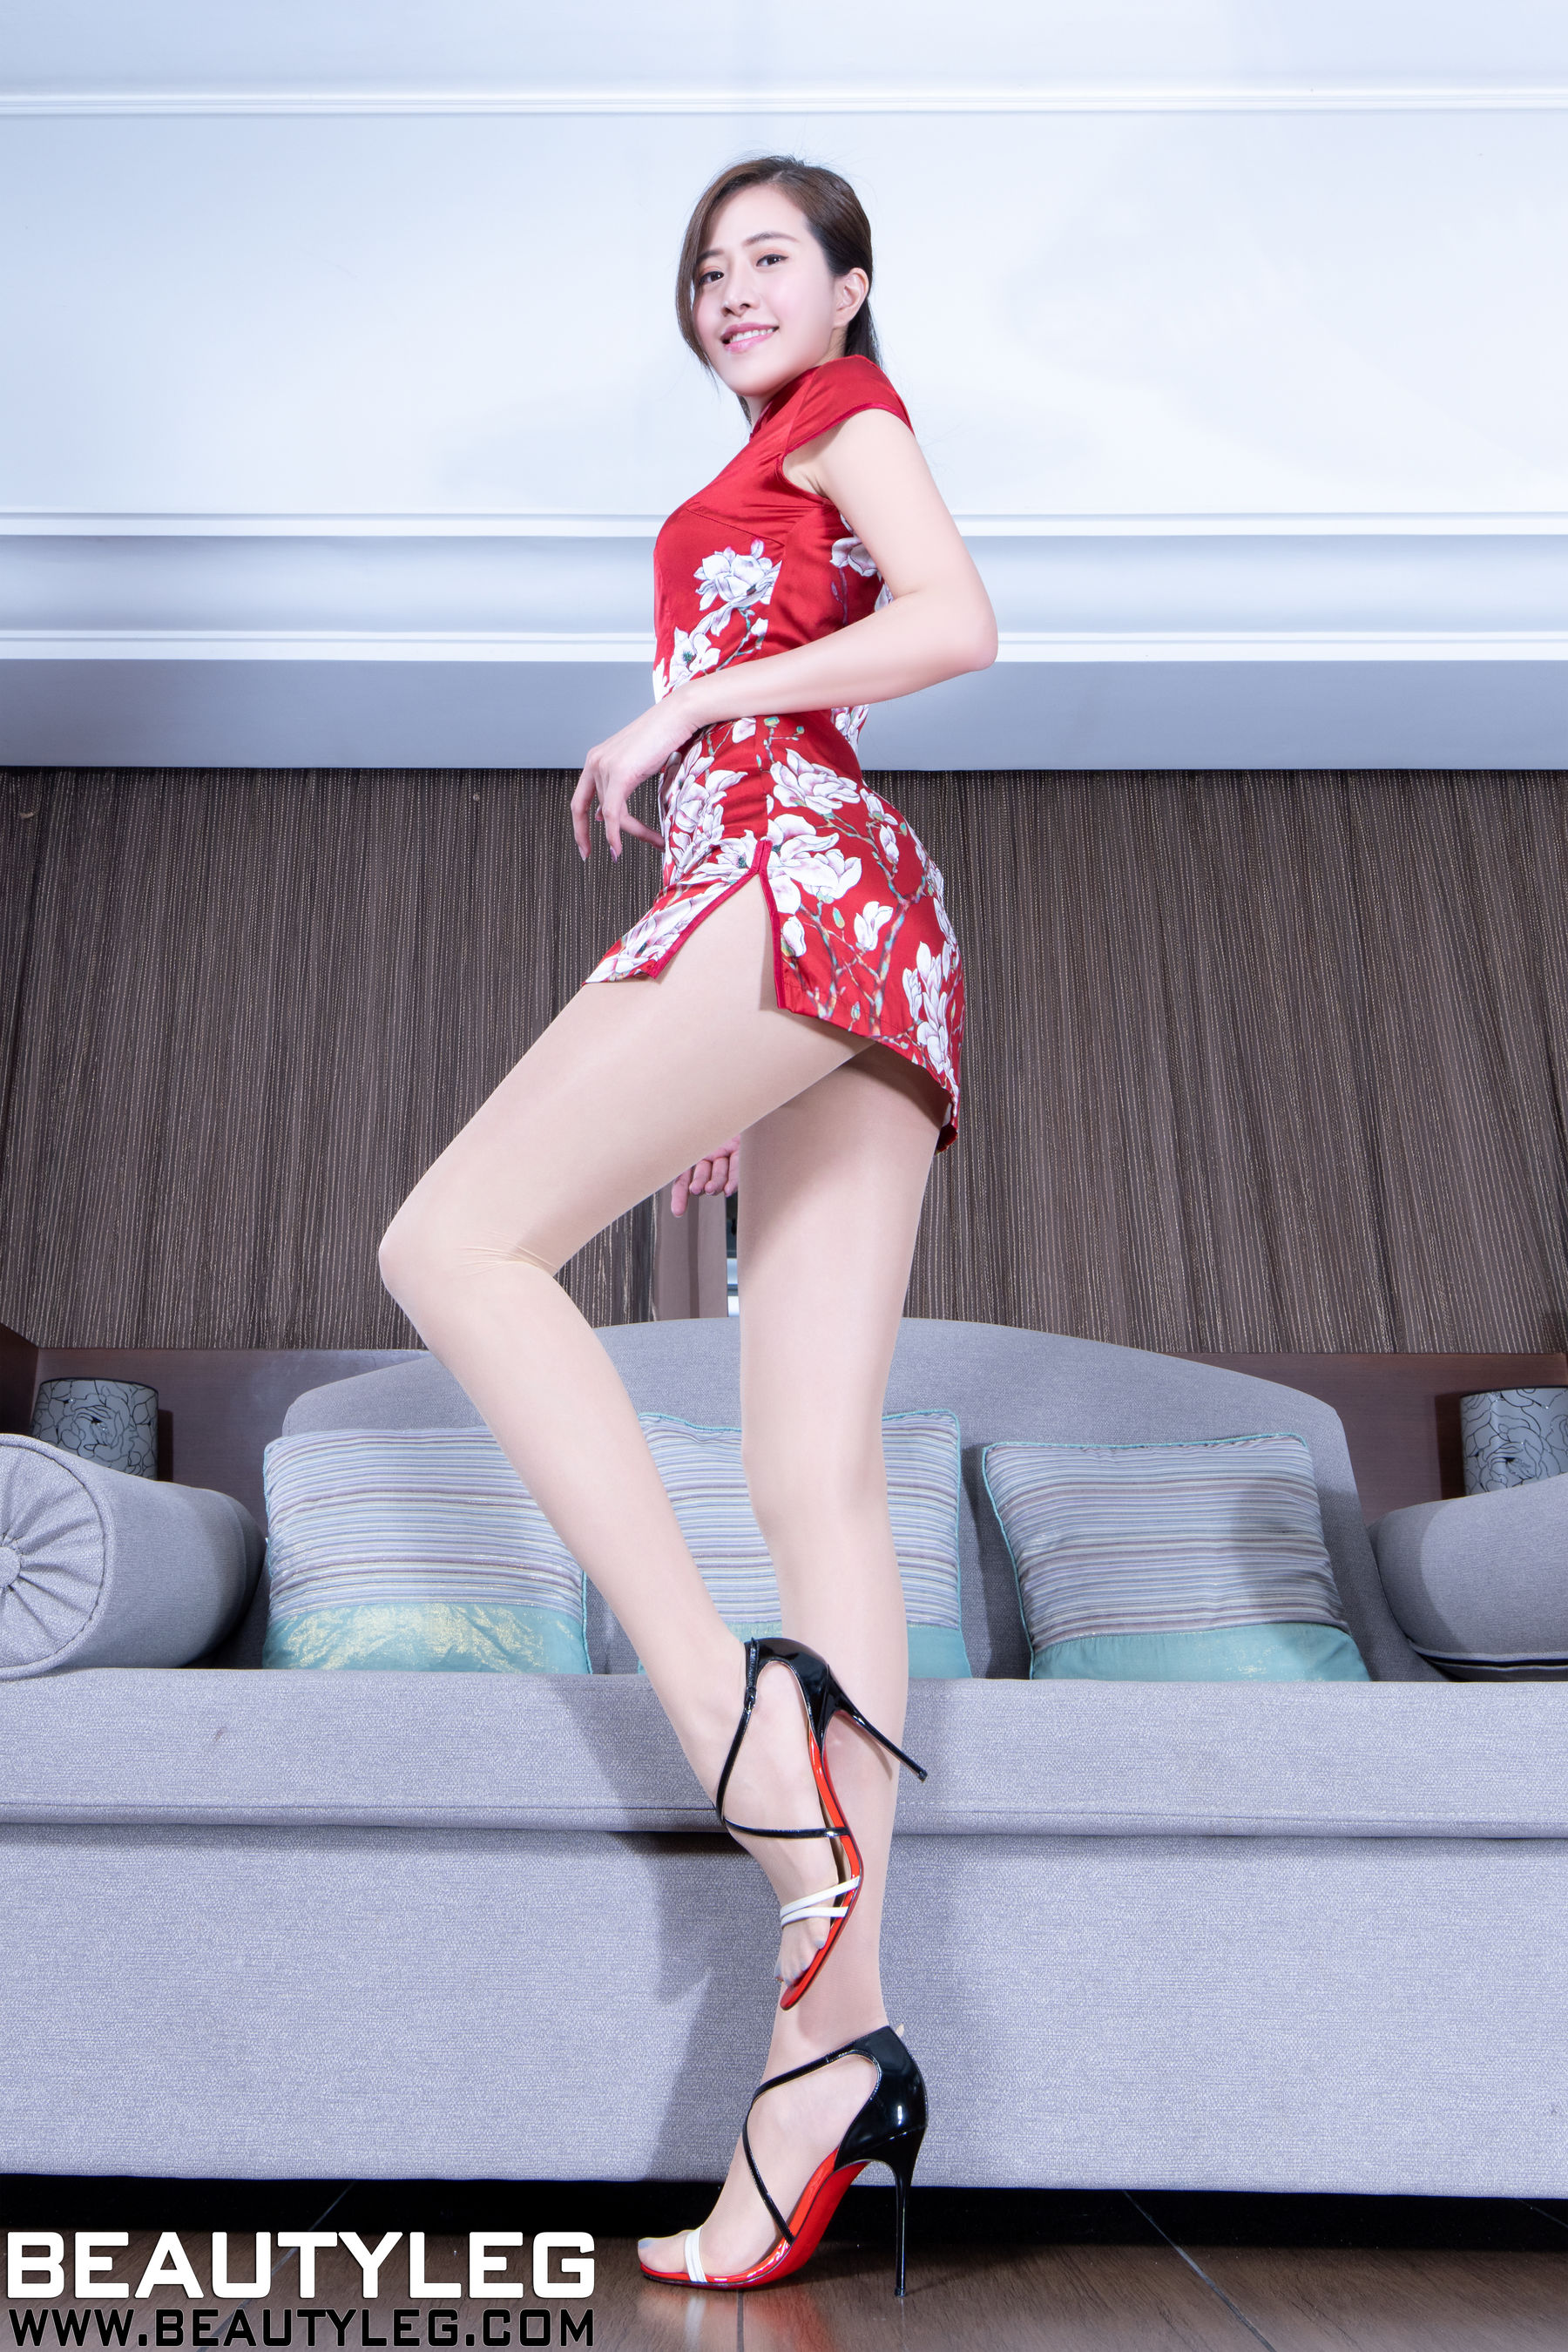 VOL.1307 [Beautyleg]丝袜美腿:张欣慈(腿模Olivia)超高清个人性感漂亮大图(33P)